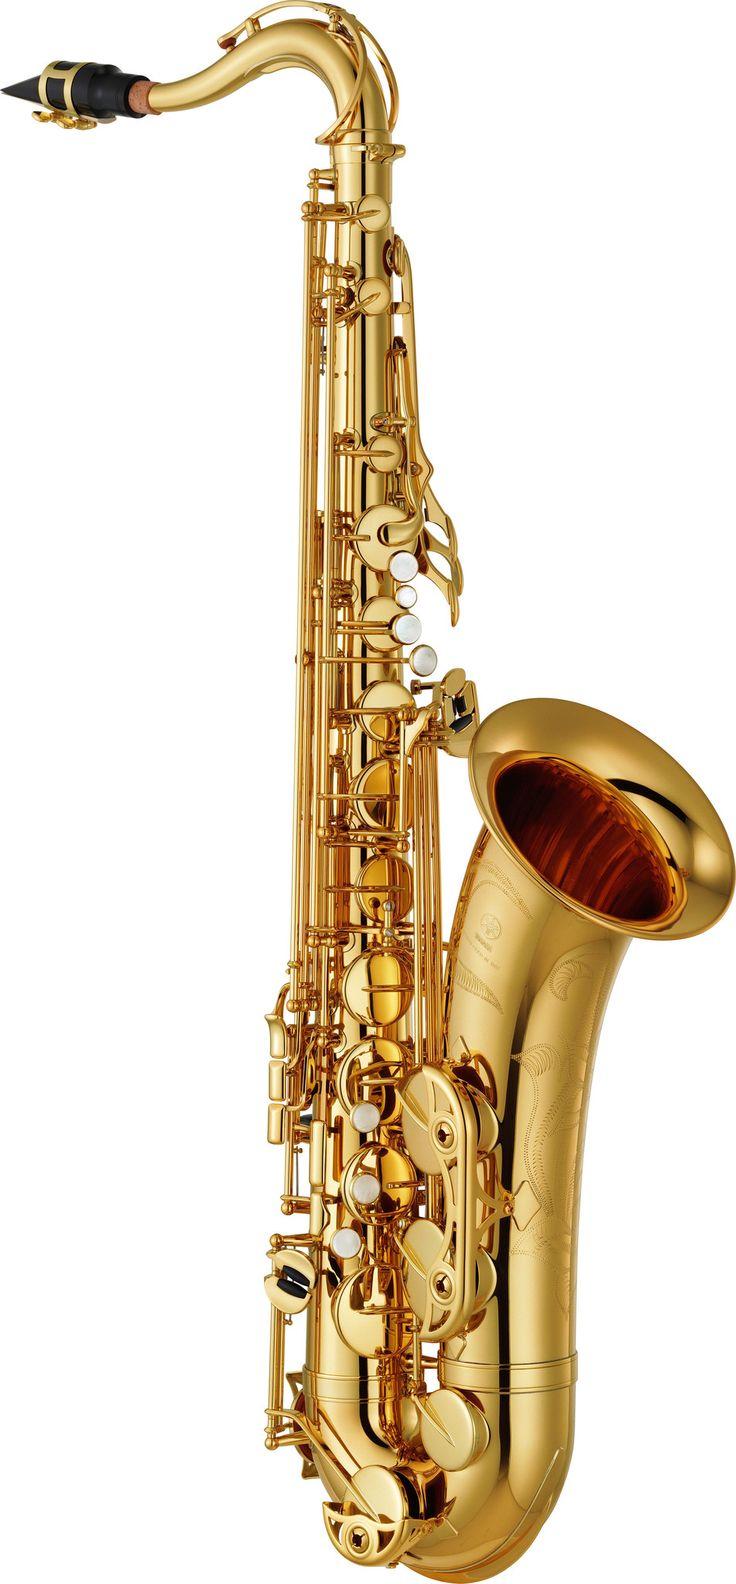 Yamaha YTS-480 Intermediate Series Tenor Saxophone